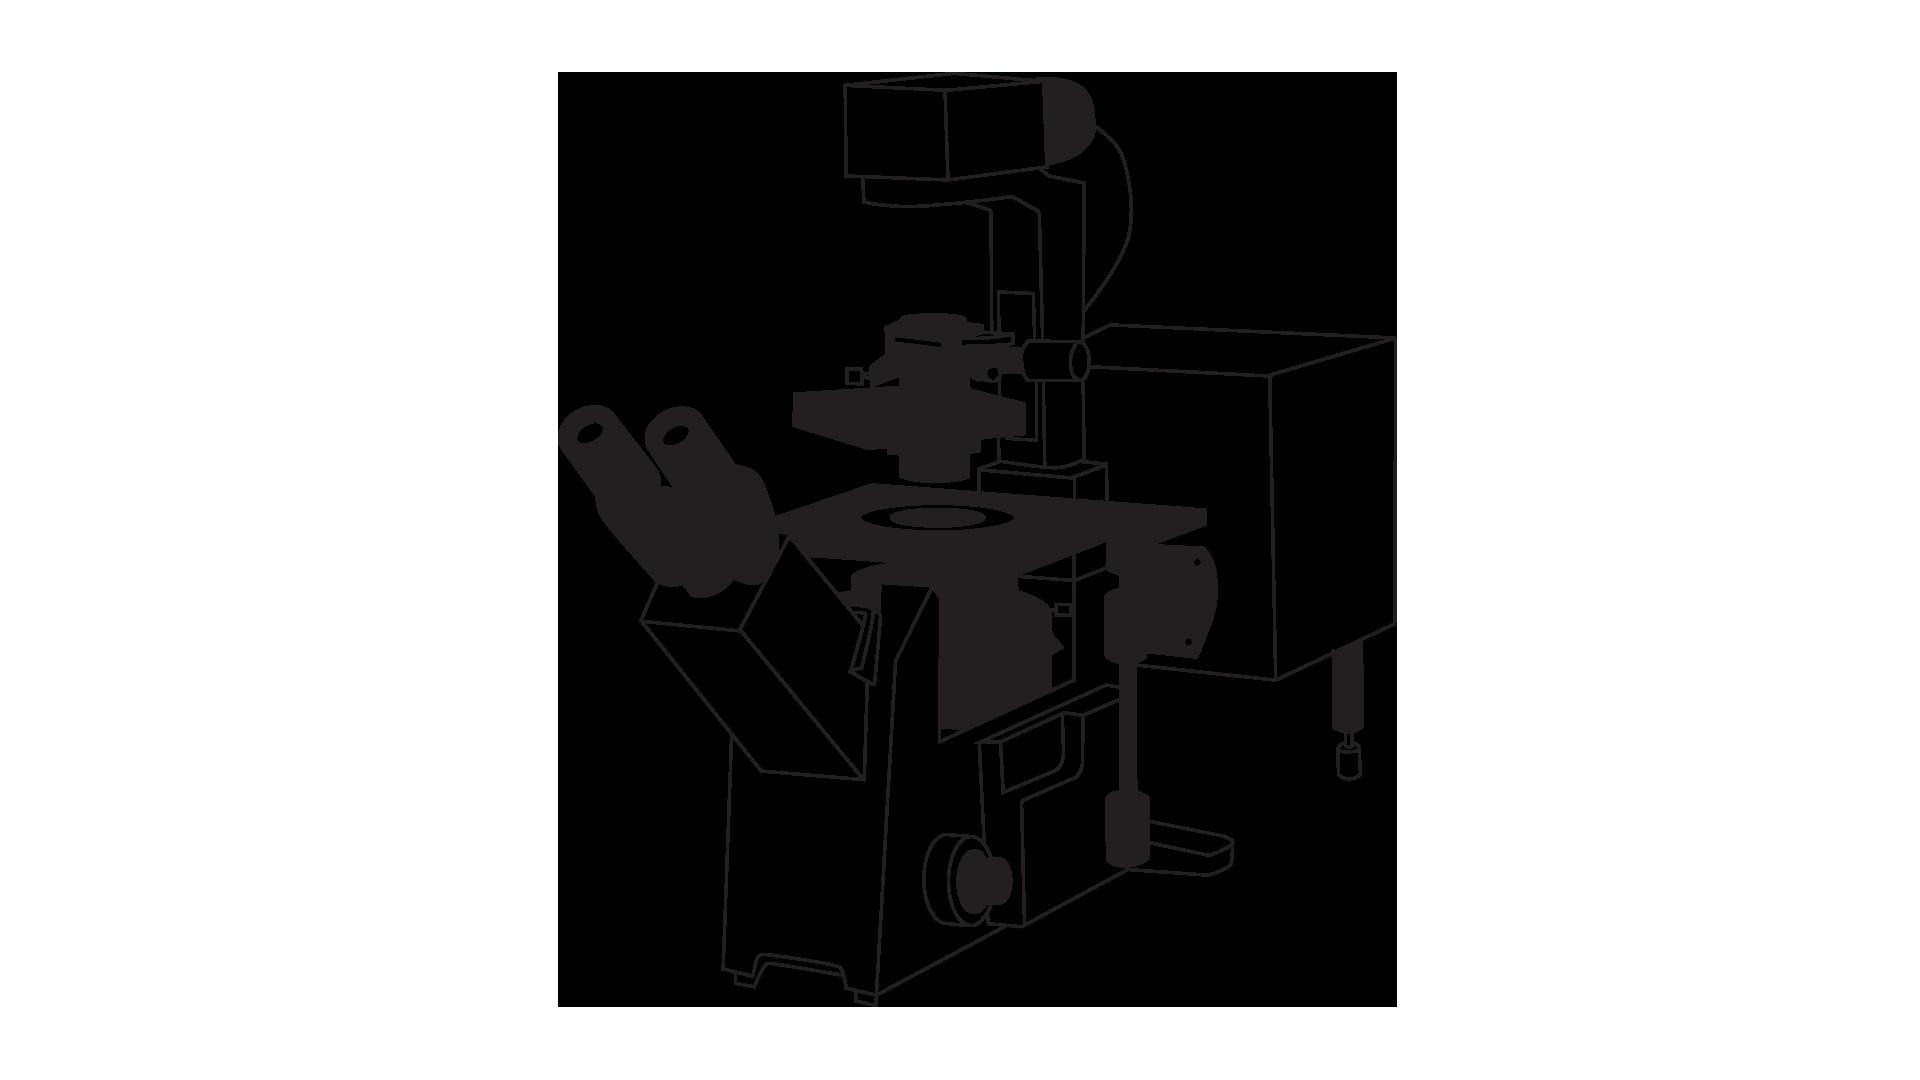 Ronald_Logan_-_microscope1.png